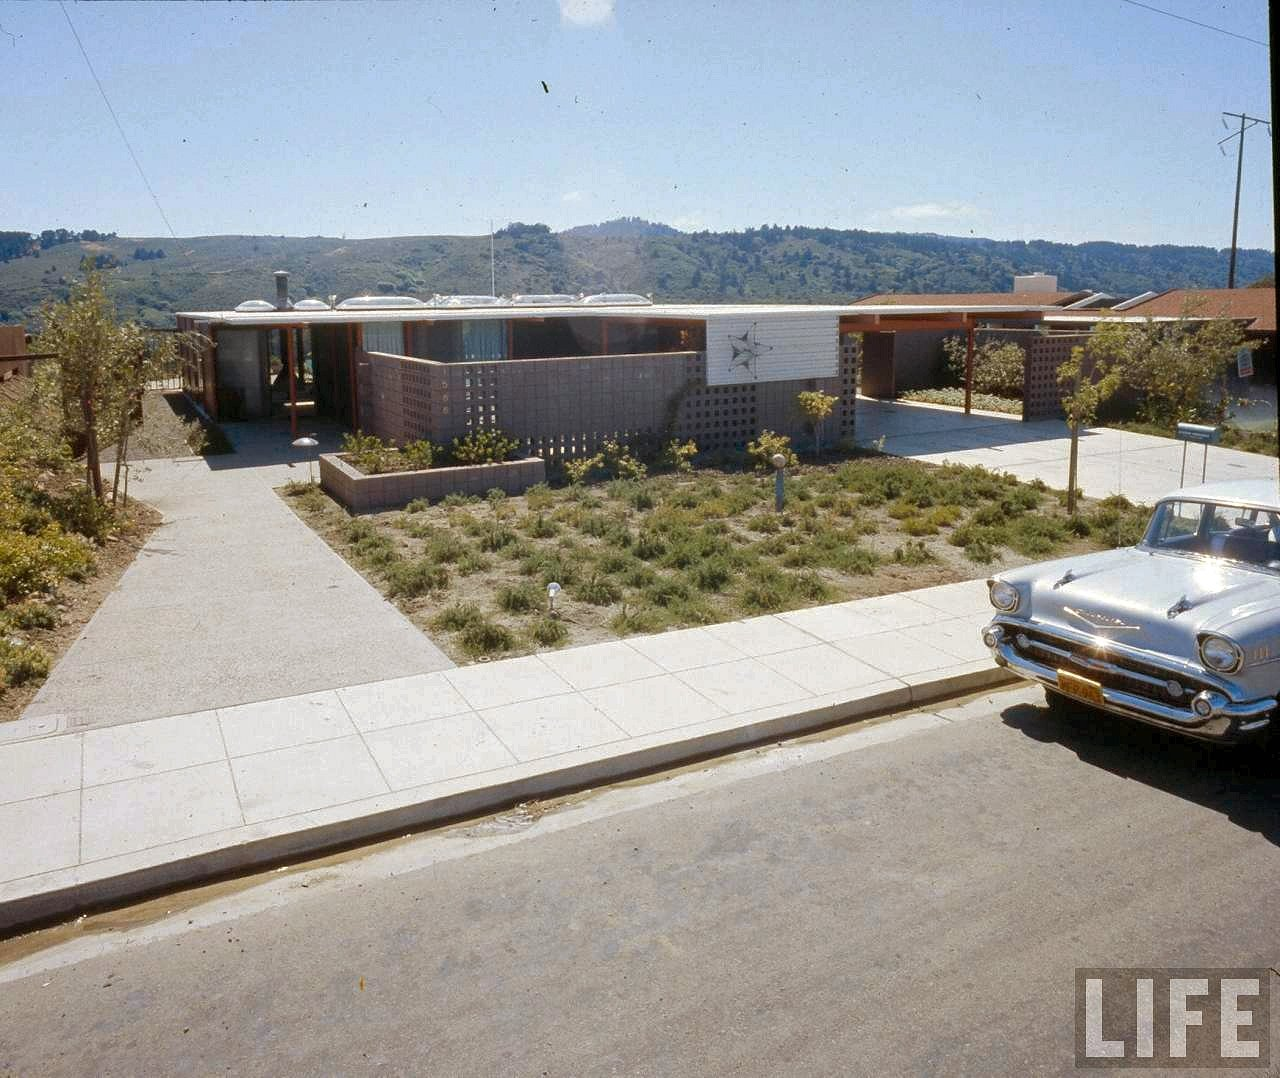 A. Quincy Jones \u0026 Frederick E. Emmons \u2013 X-100 1586 Lexington Ave. San Mateo CA \u2013 1956 & MidCentury Architecture | Celebrating the creative period of modern ...